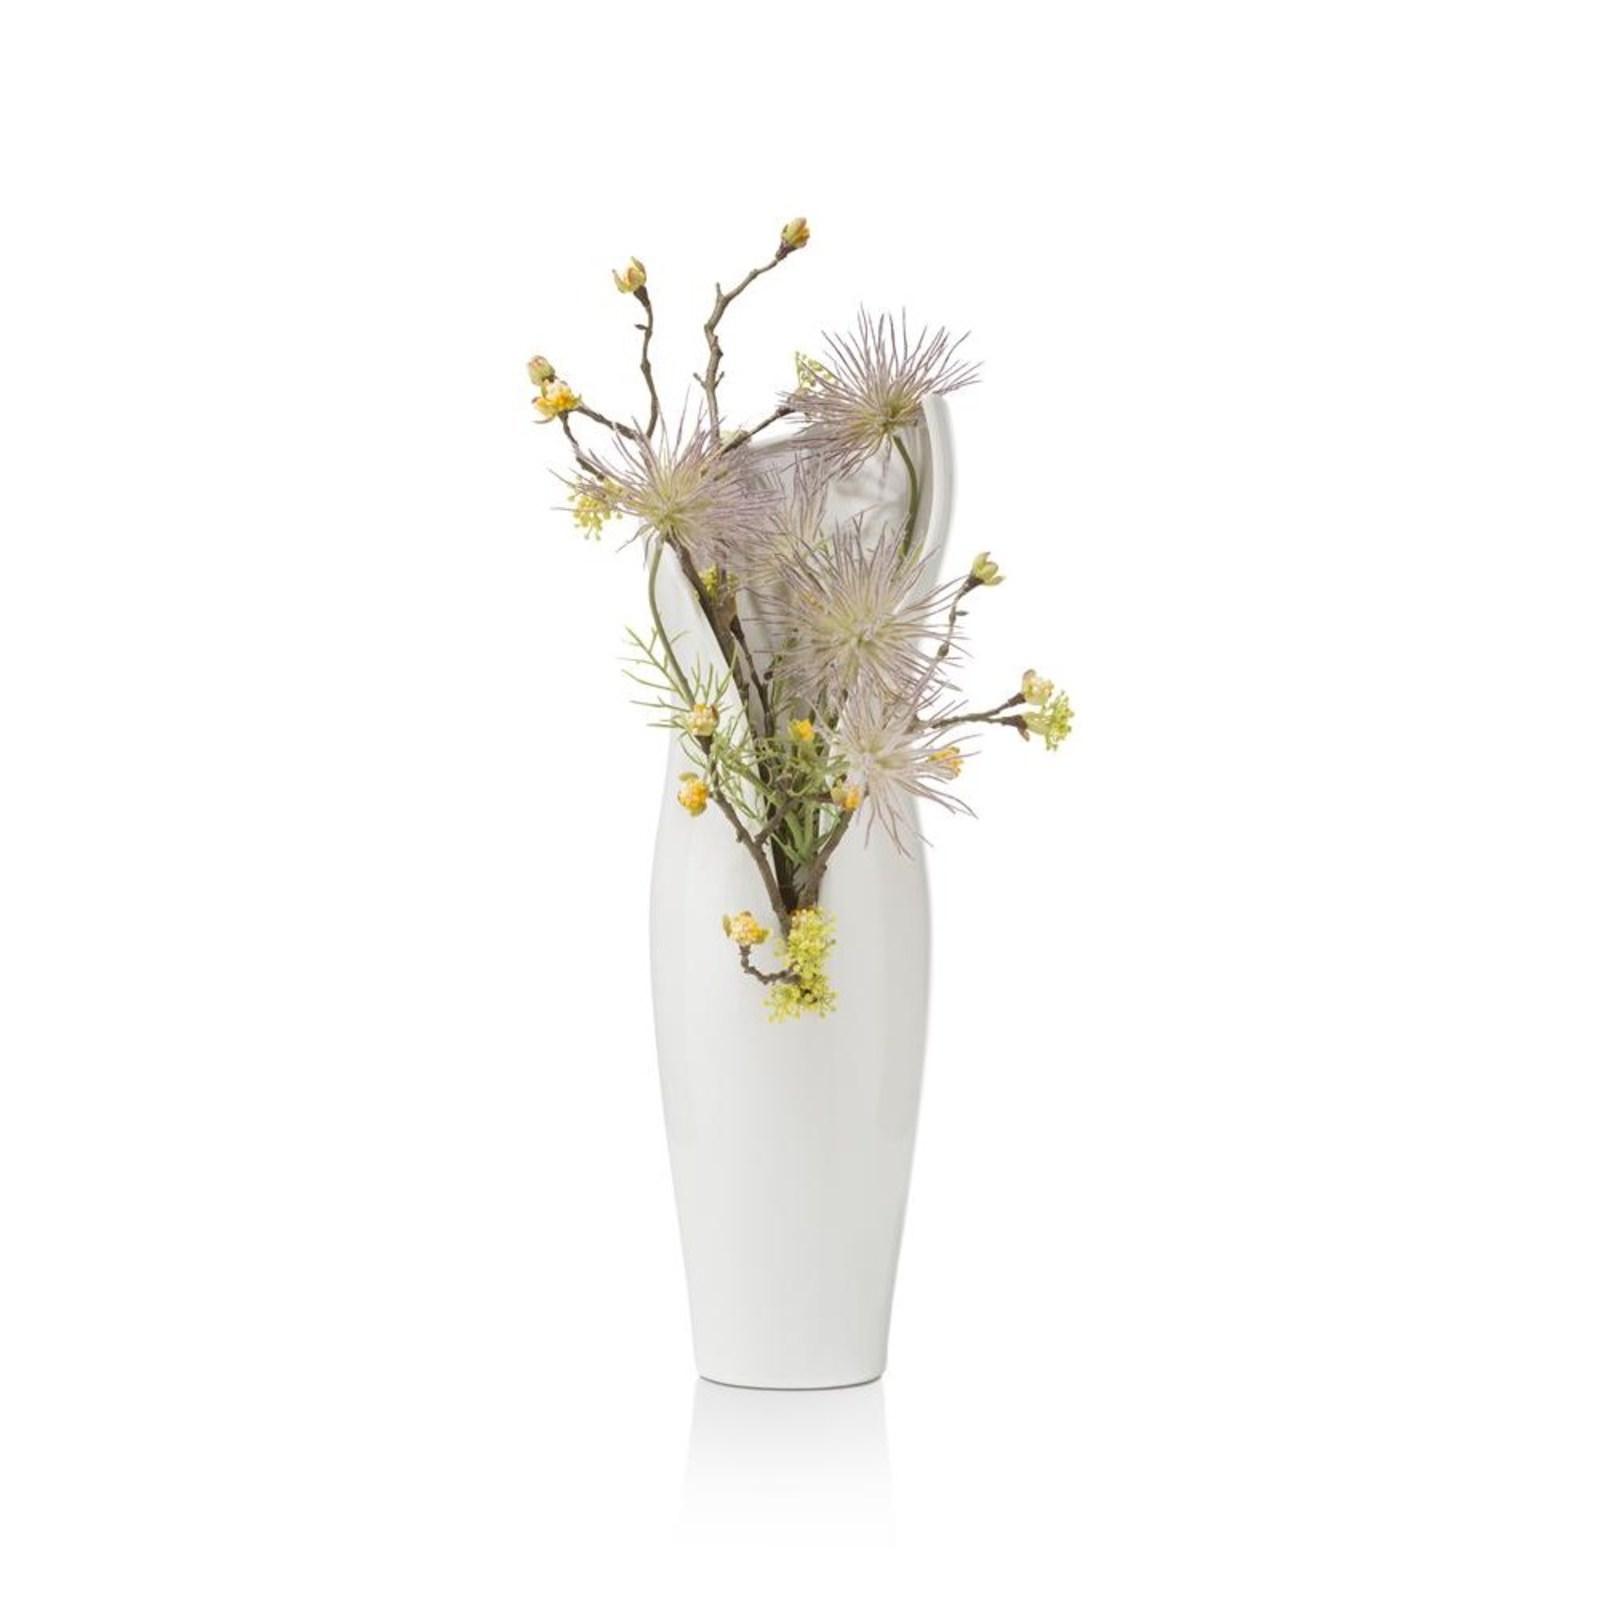 vaas olivia large in wit nu bestellen in de coco maison. Black Bedroom Furniture Sets. Home Design Ideas